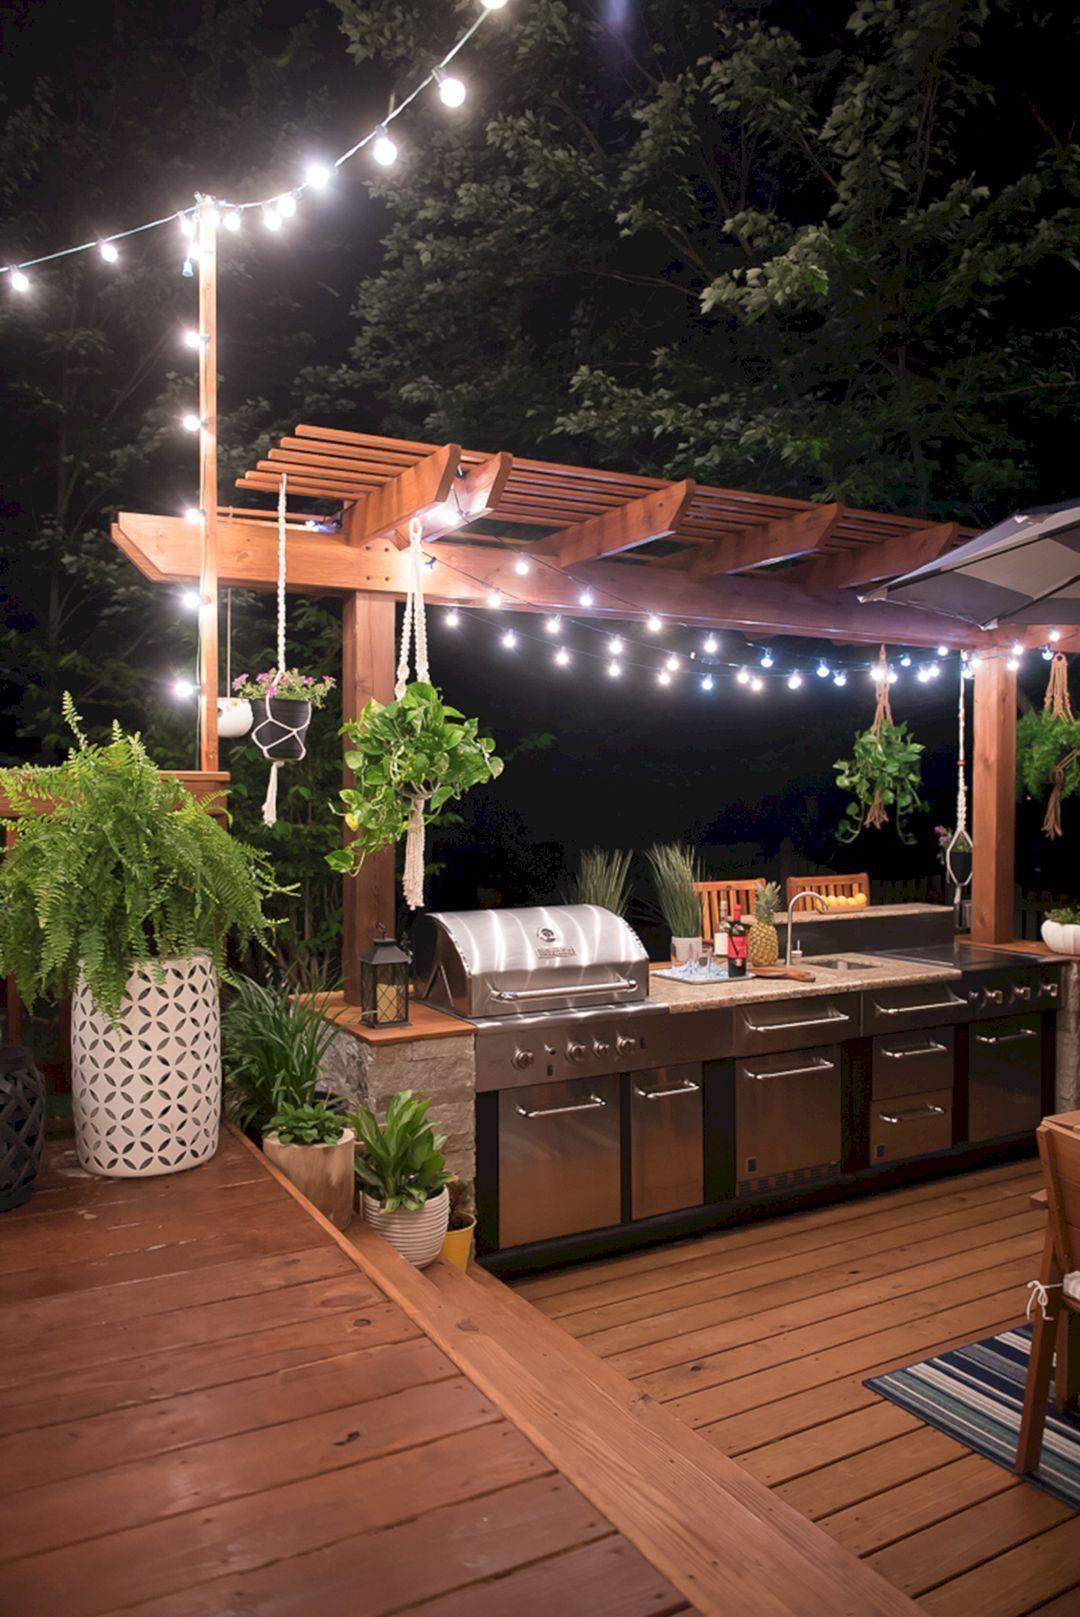 10 outdoor bar ideas from rustic to lavish  diy outdoor